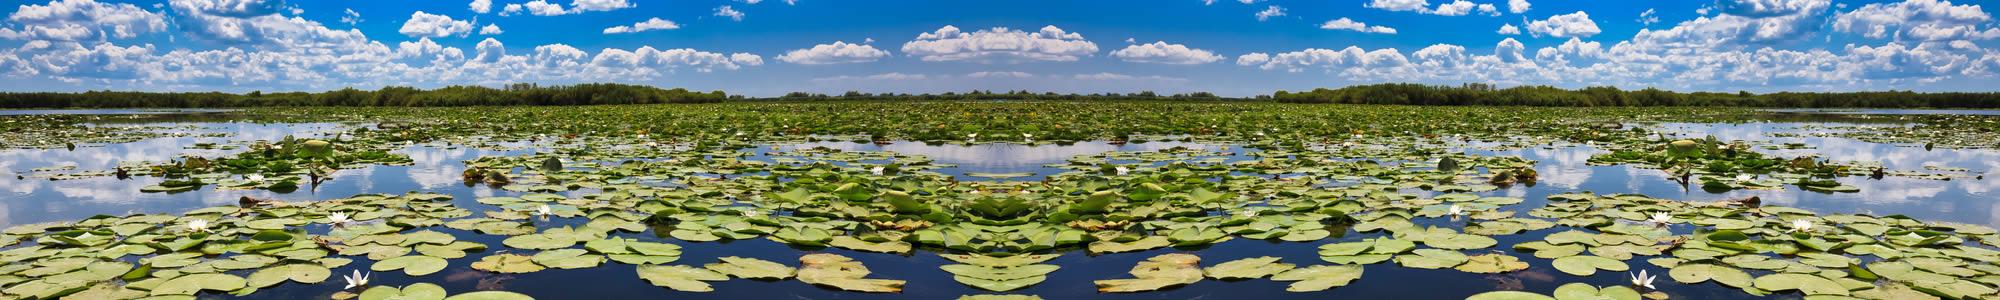 Water lilies in Danube Delta